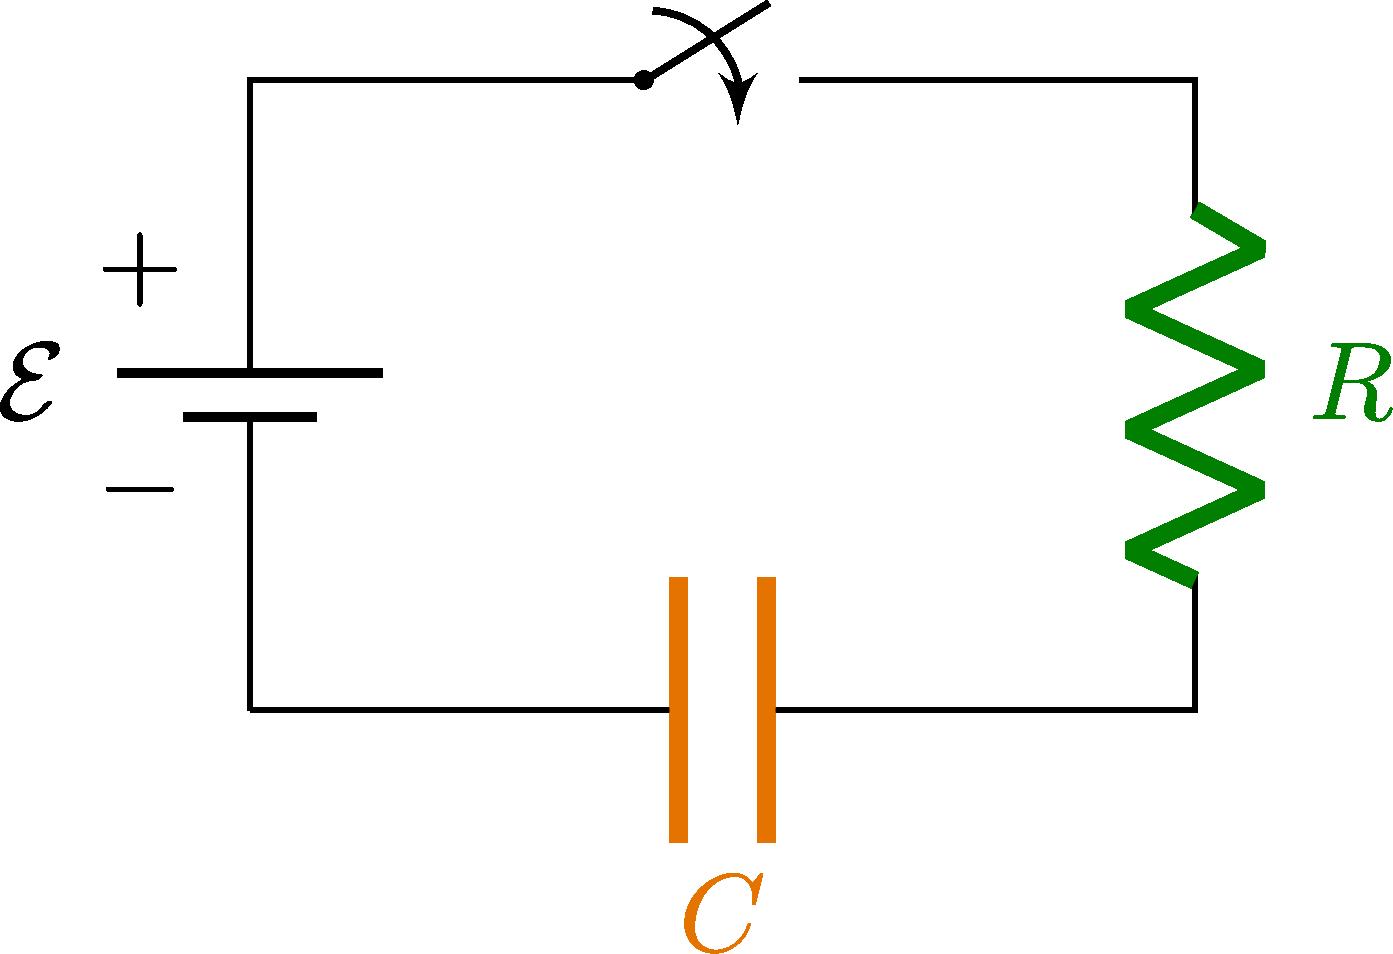 electric_circuit_rc-003.png